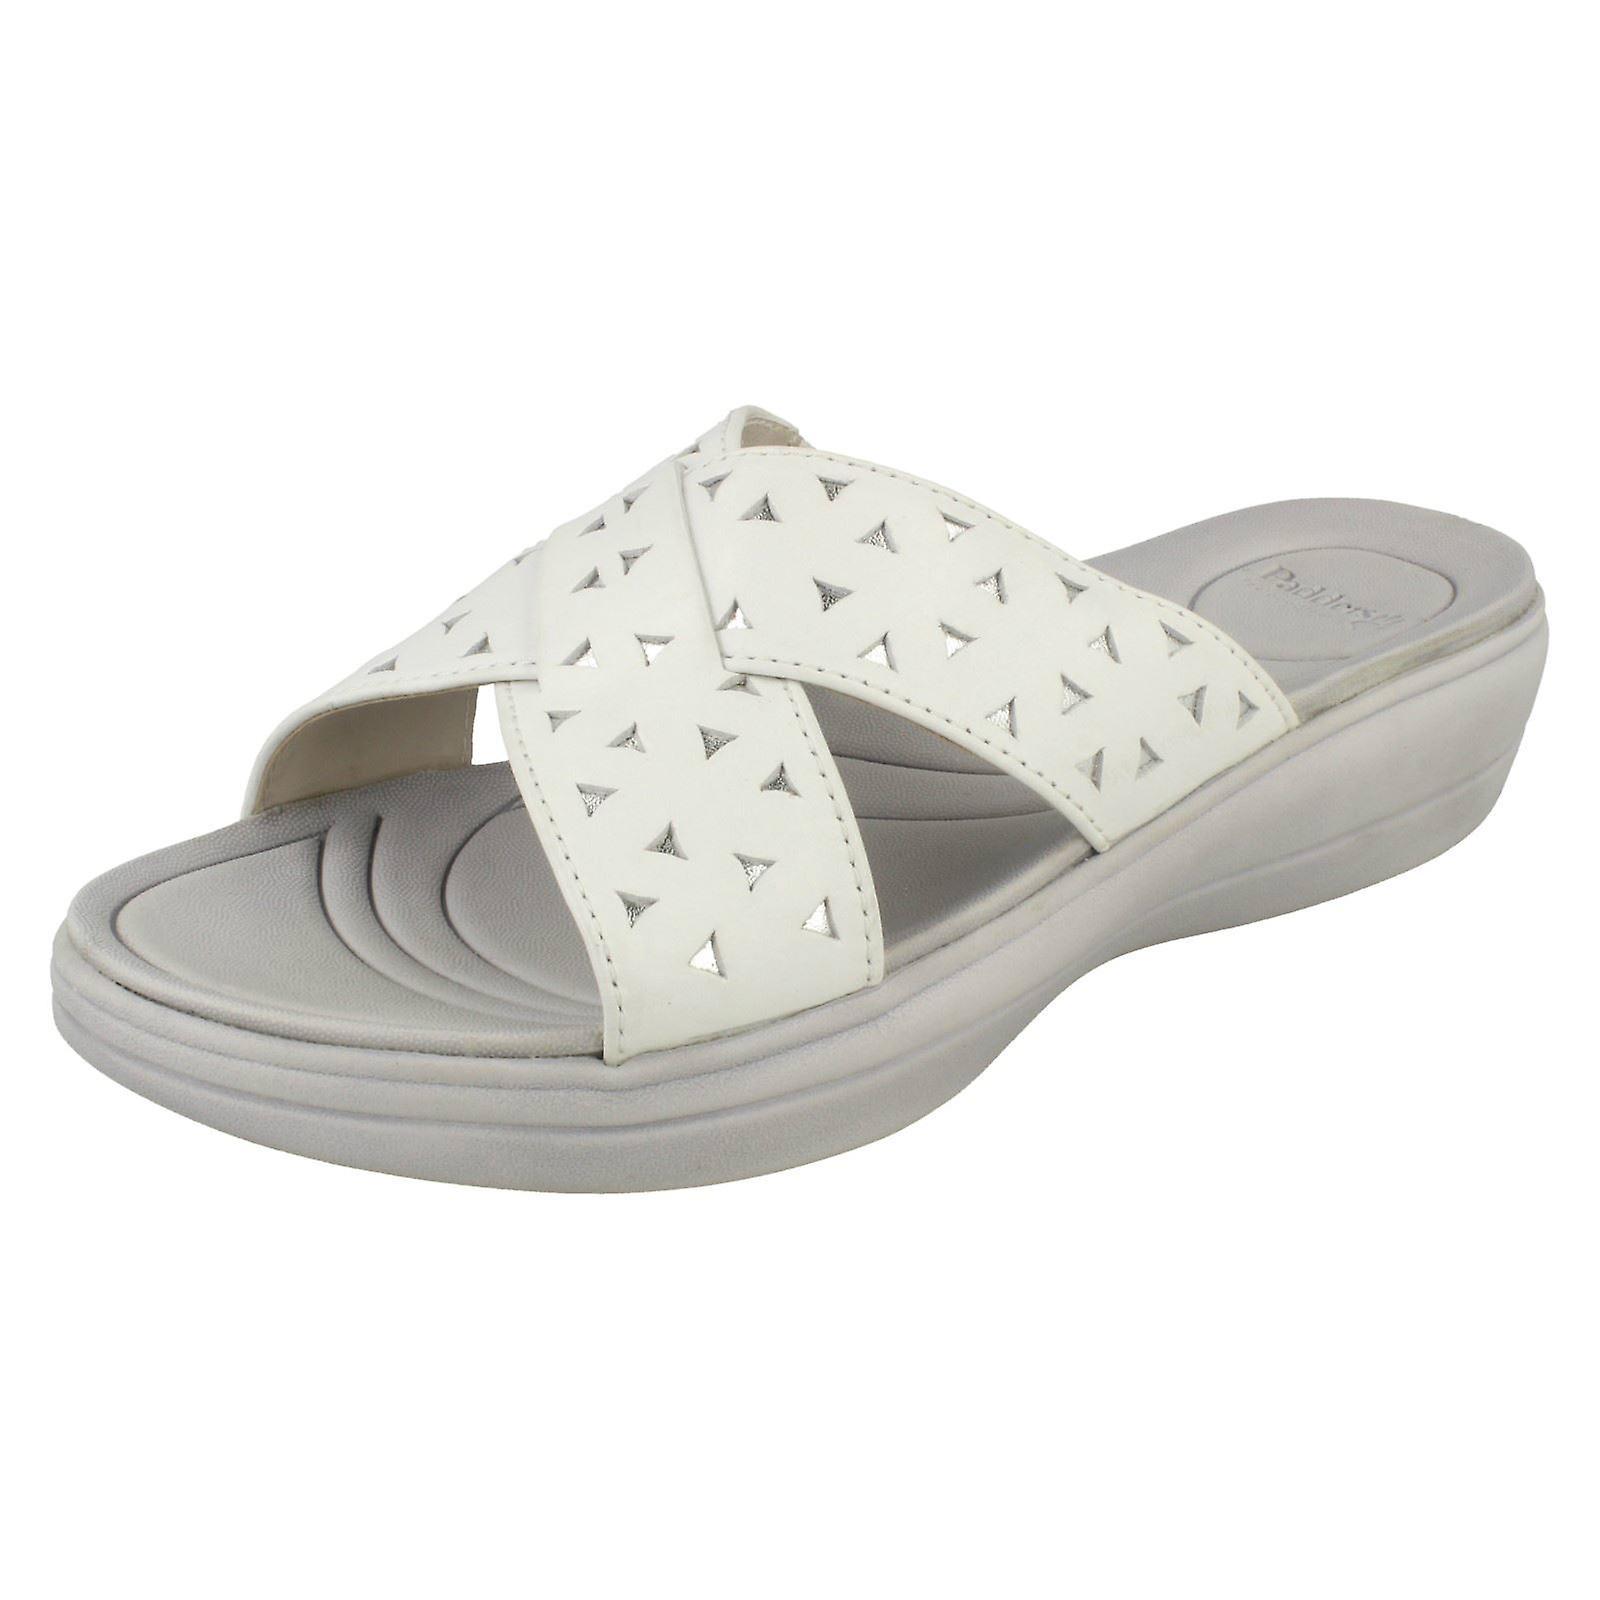 Panie Padders szerokim montażu sandały Clara iVJK3